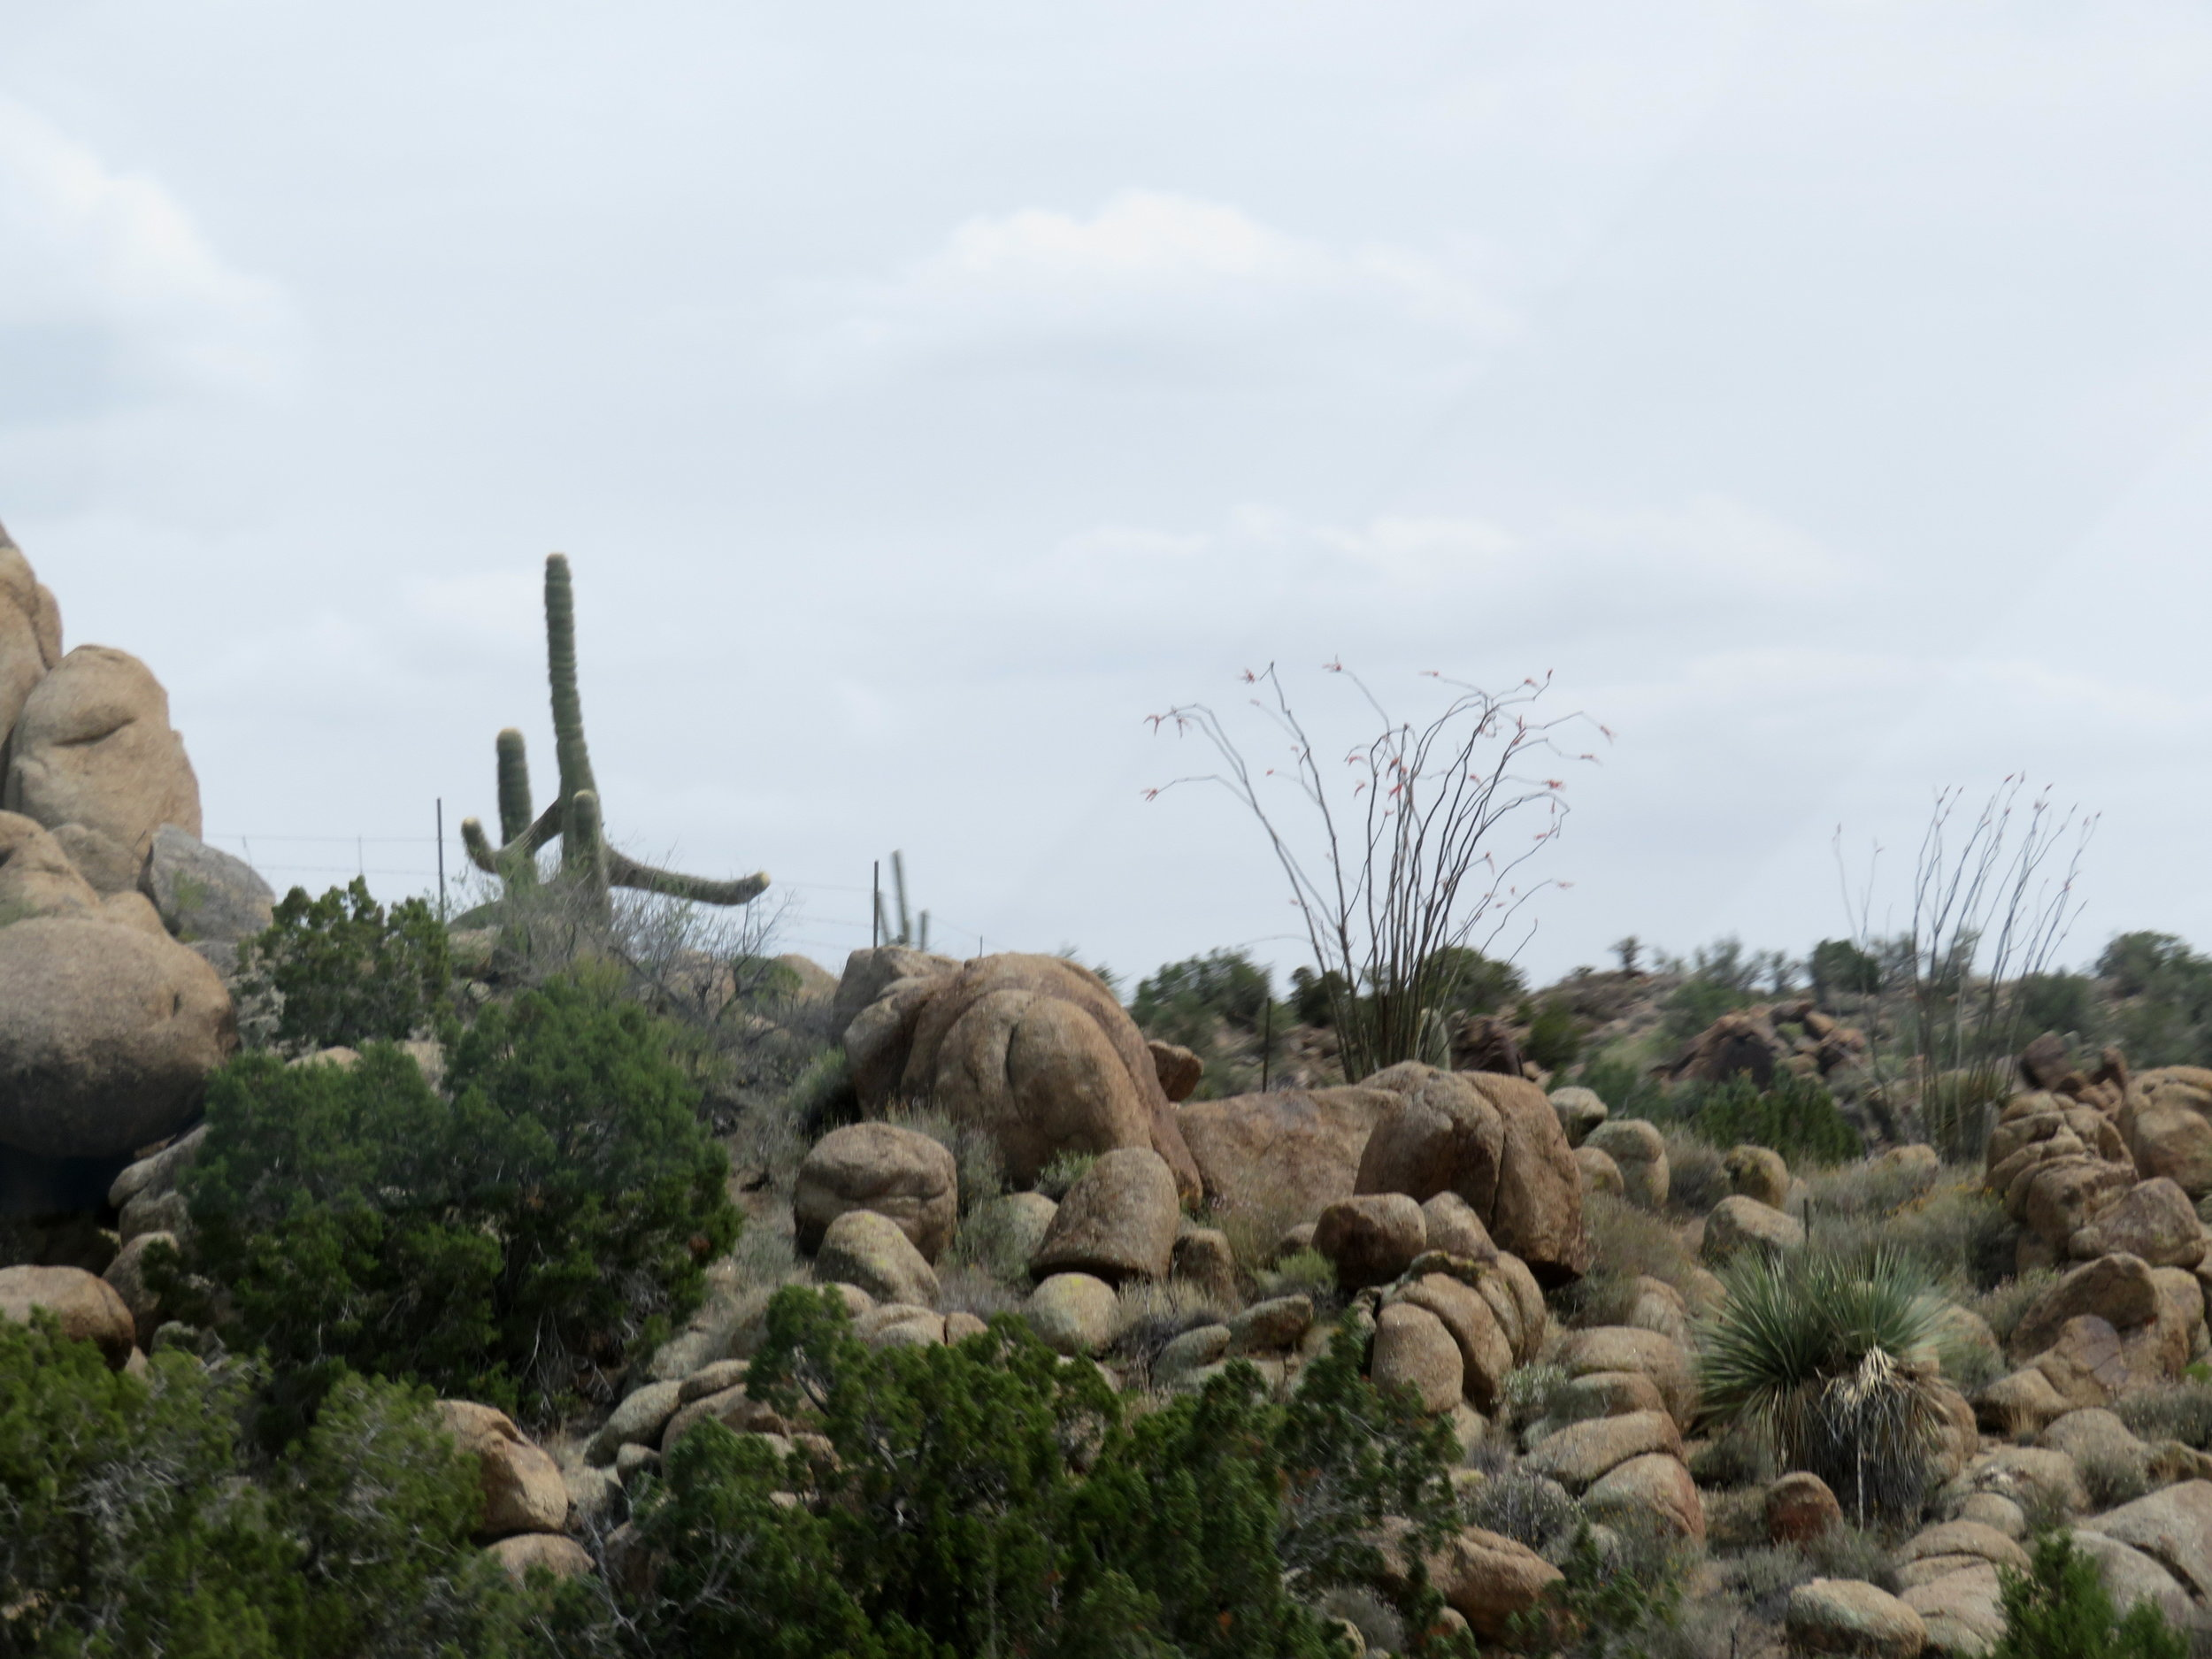 Rough desert terrain